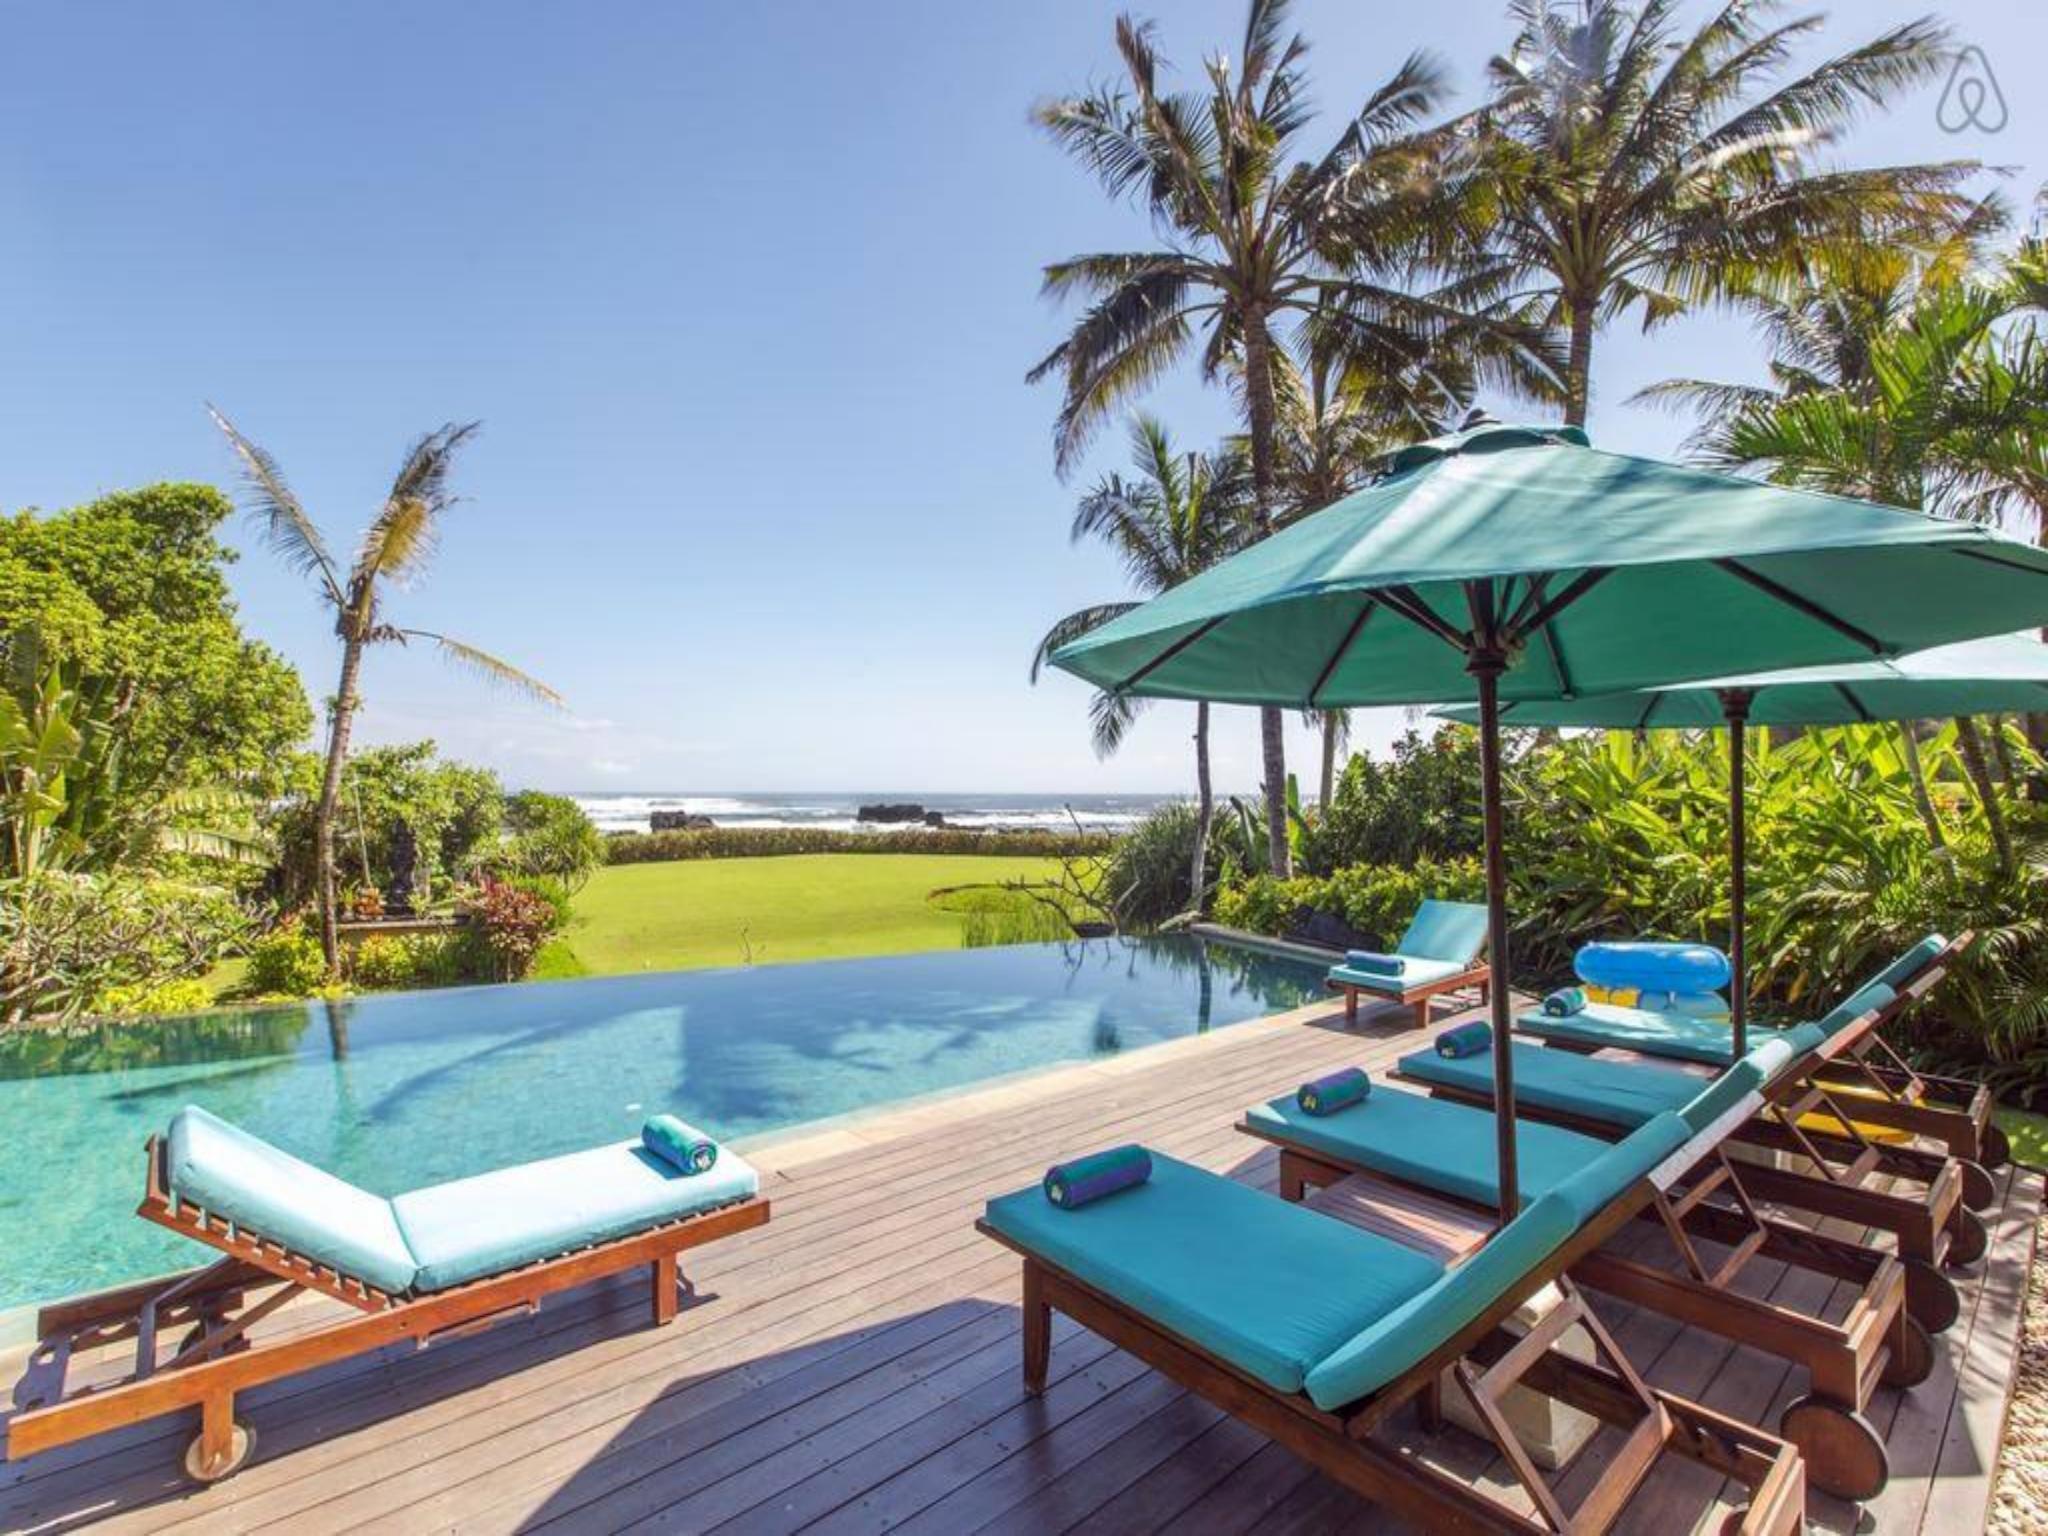 4 Bedroom Beach Front Villas At Canggu